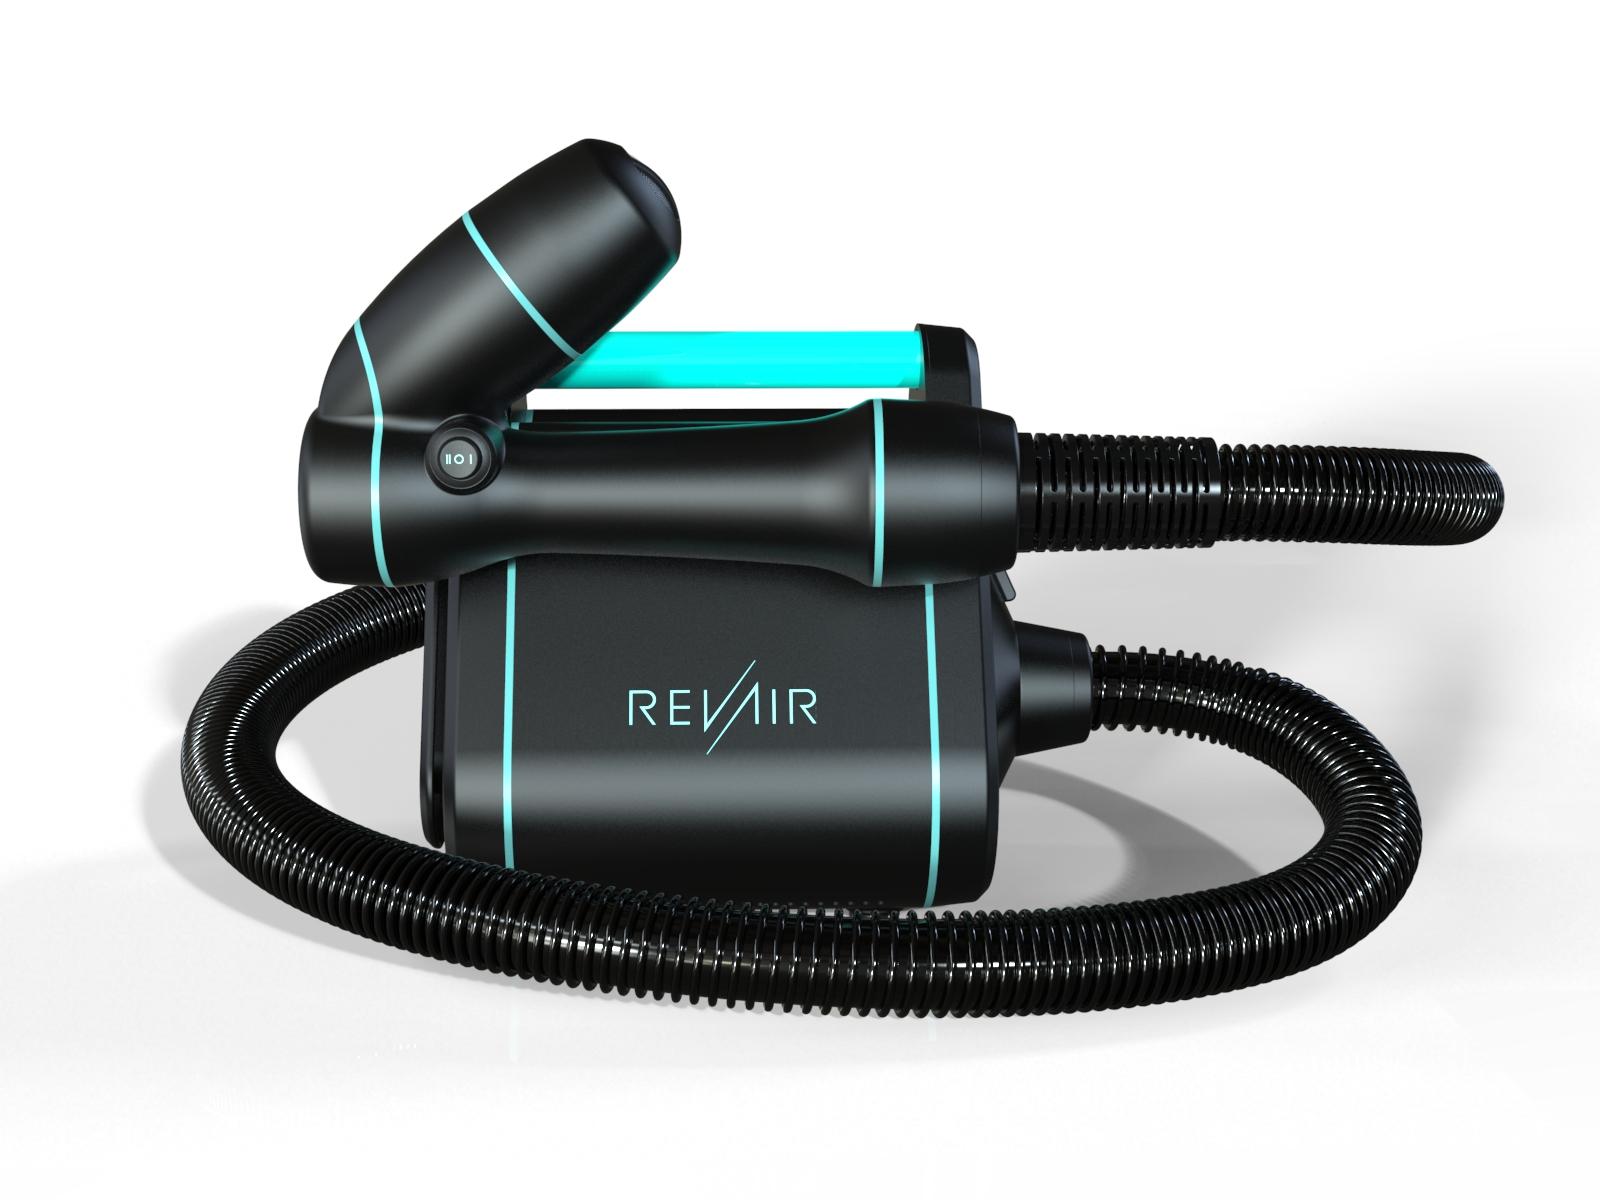 REVAIR reverseair dryer Air hair dryer, Best hair dryer